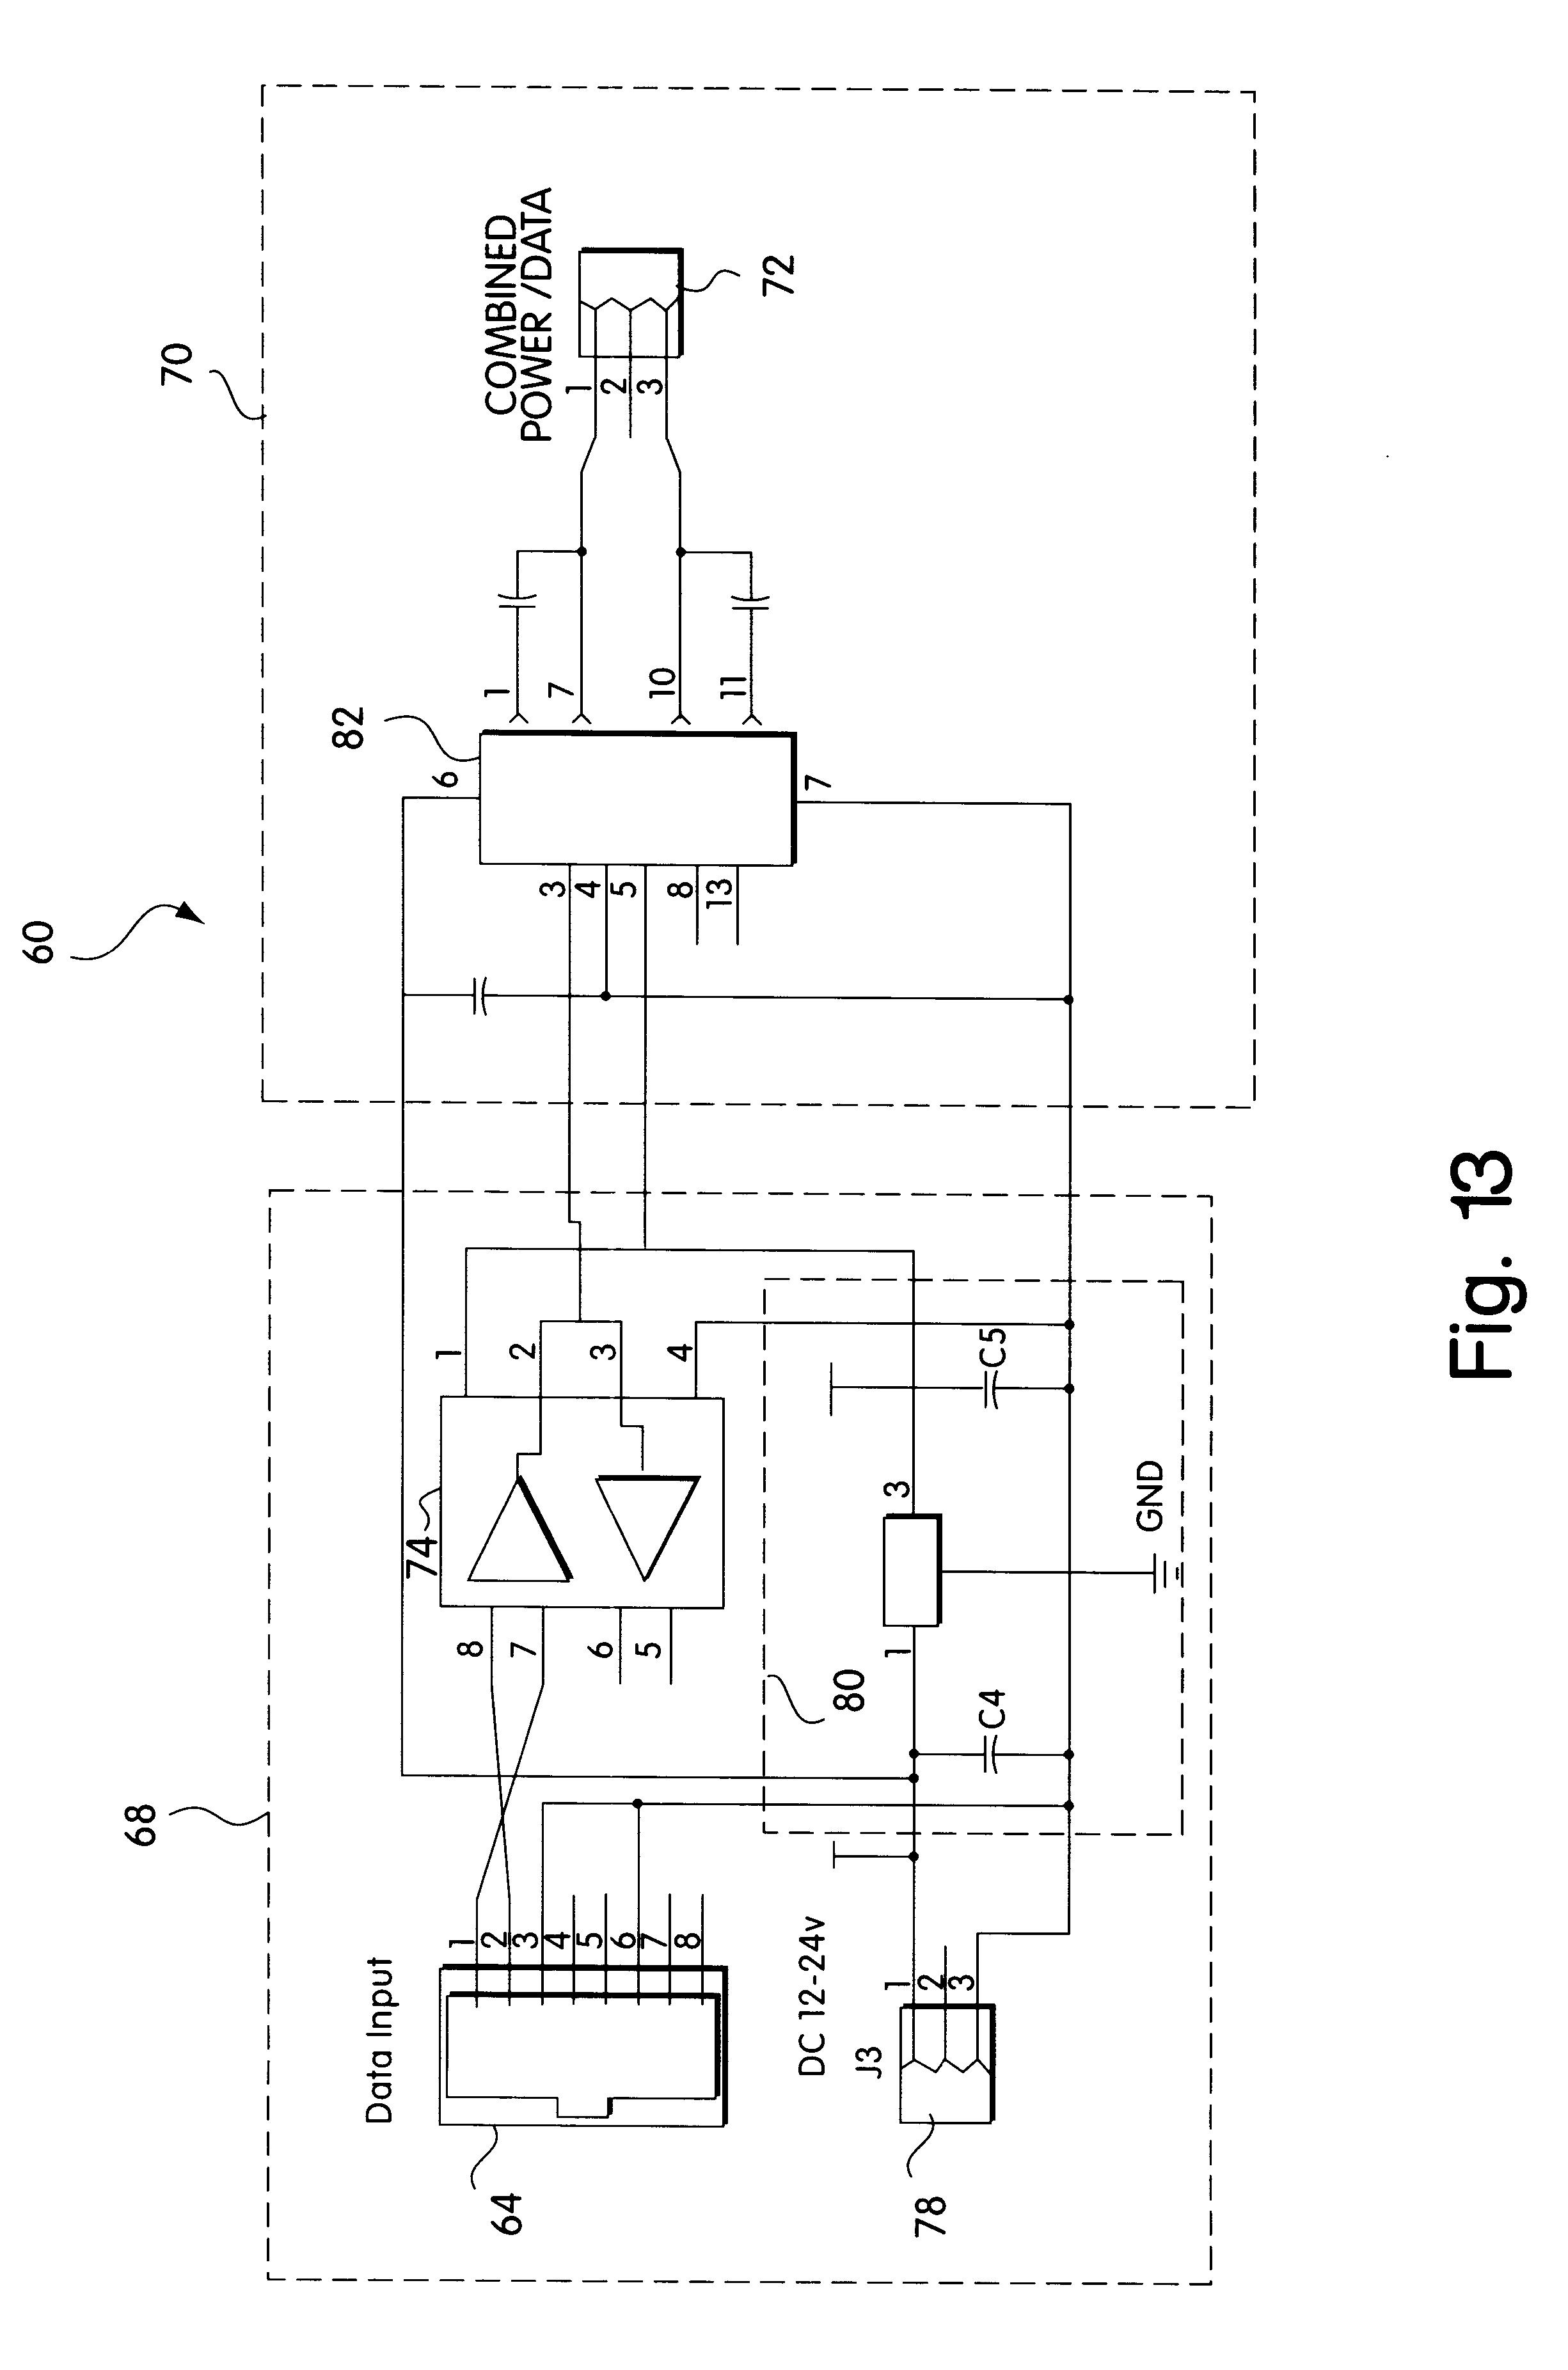 Patent US 6,340,868 B1 on